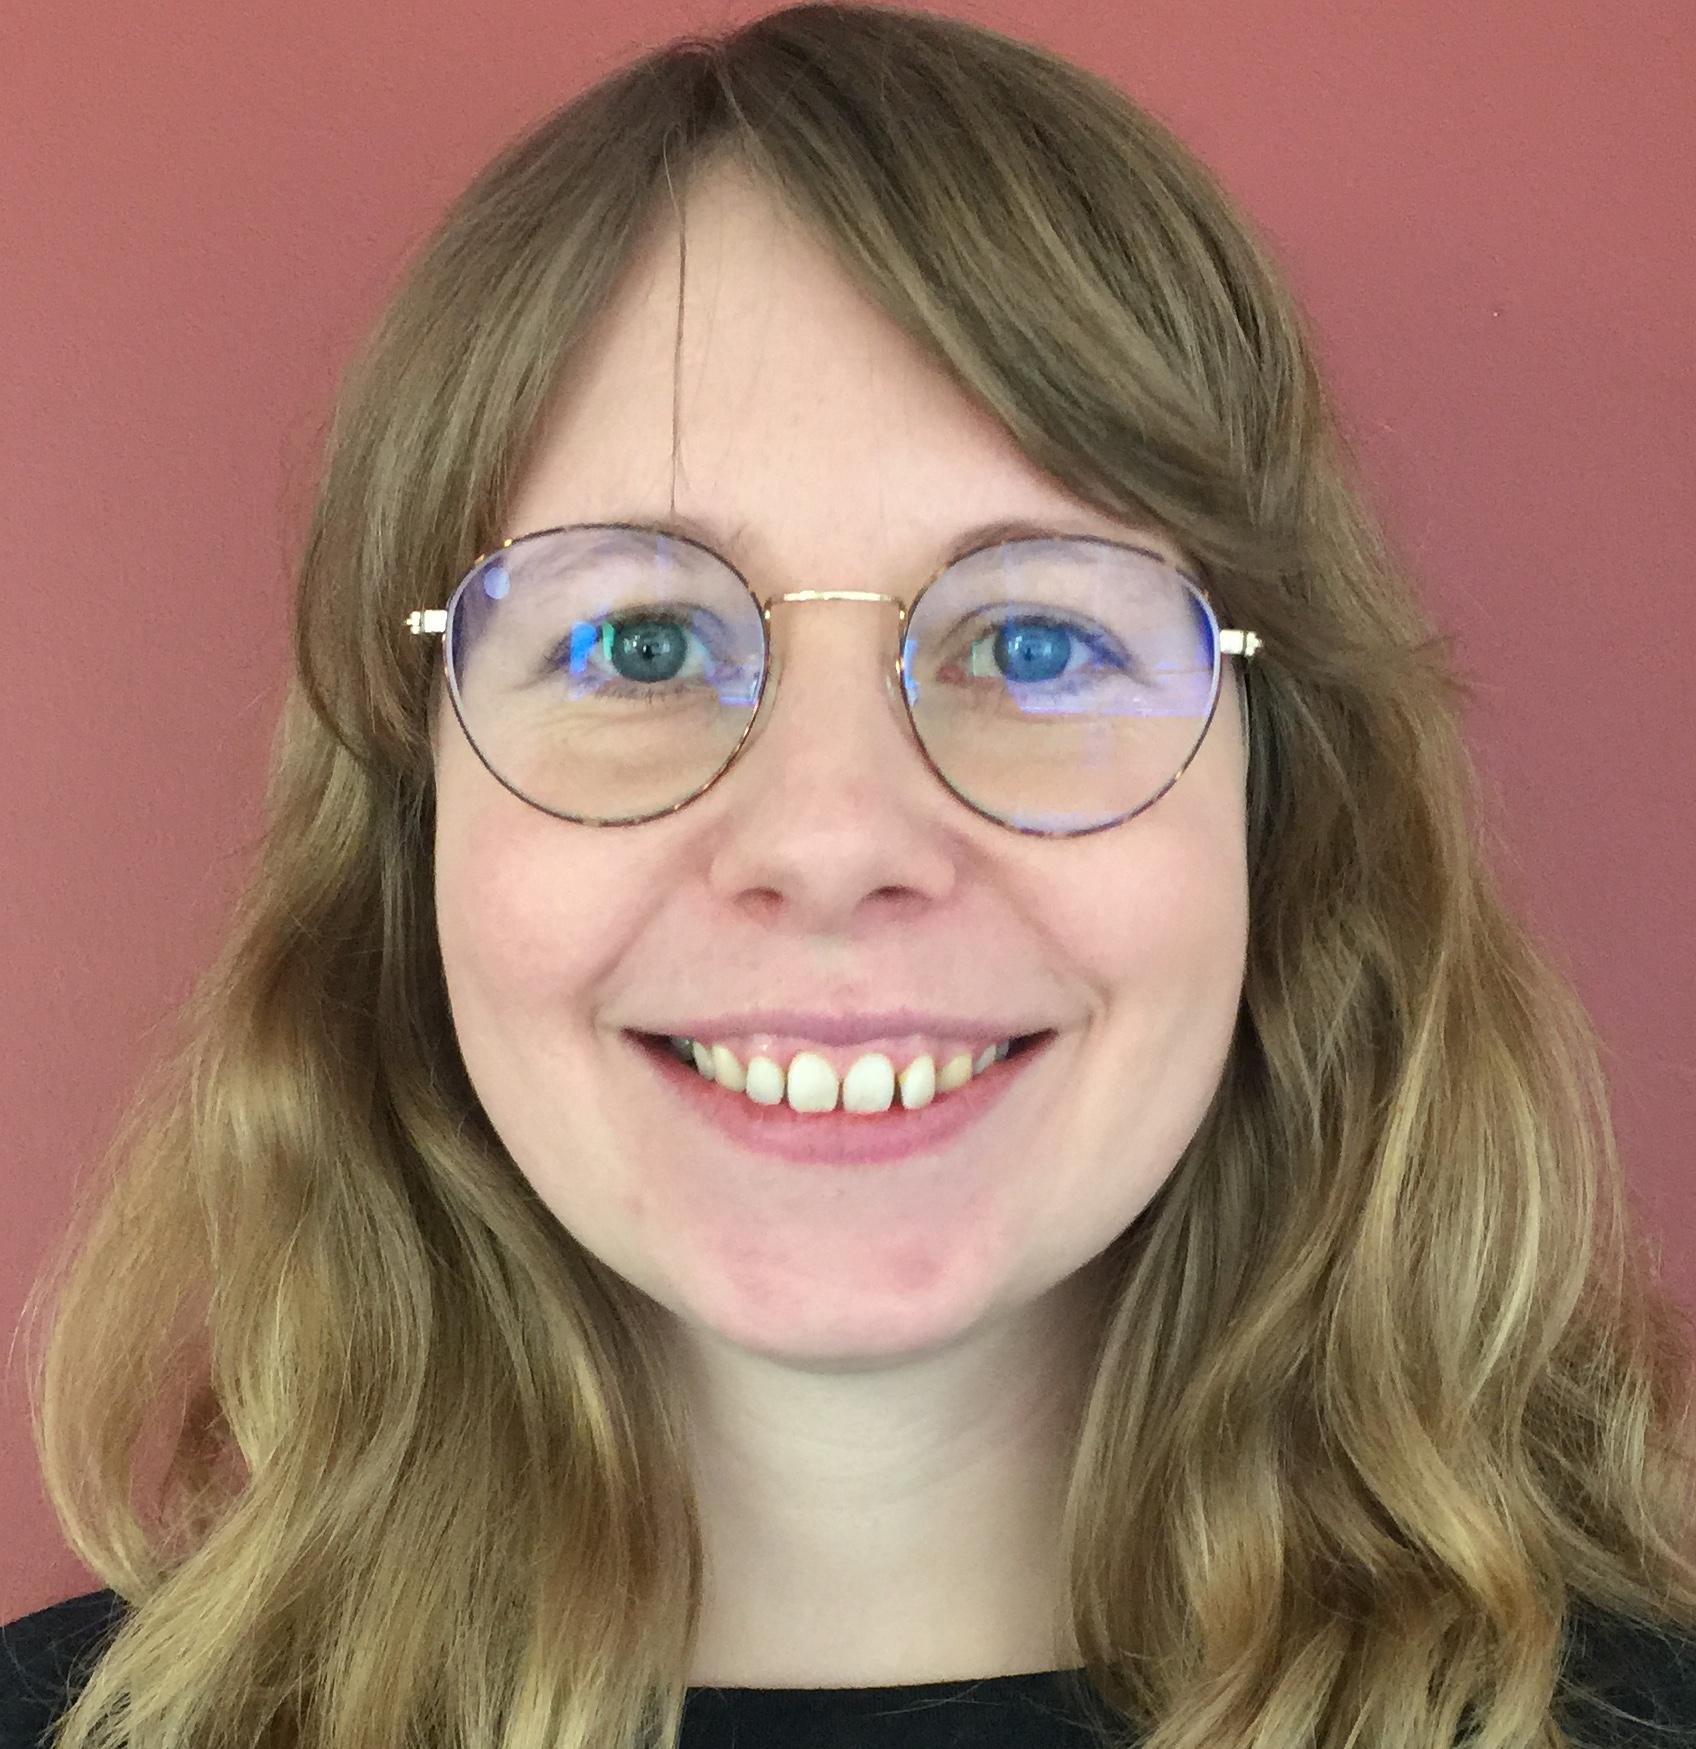 Sofia Österborg Wiklund